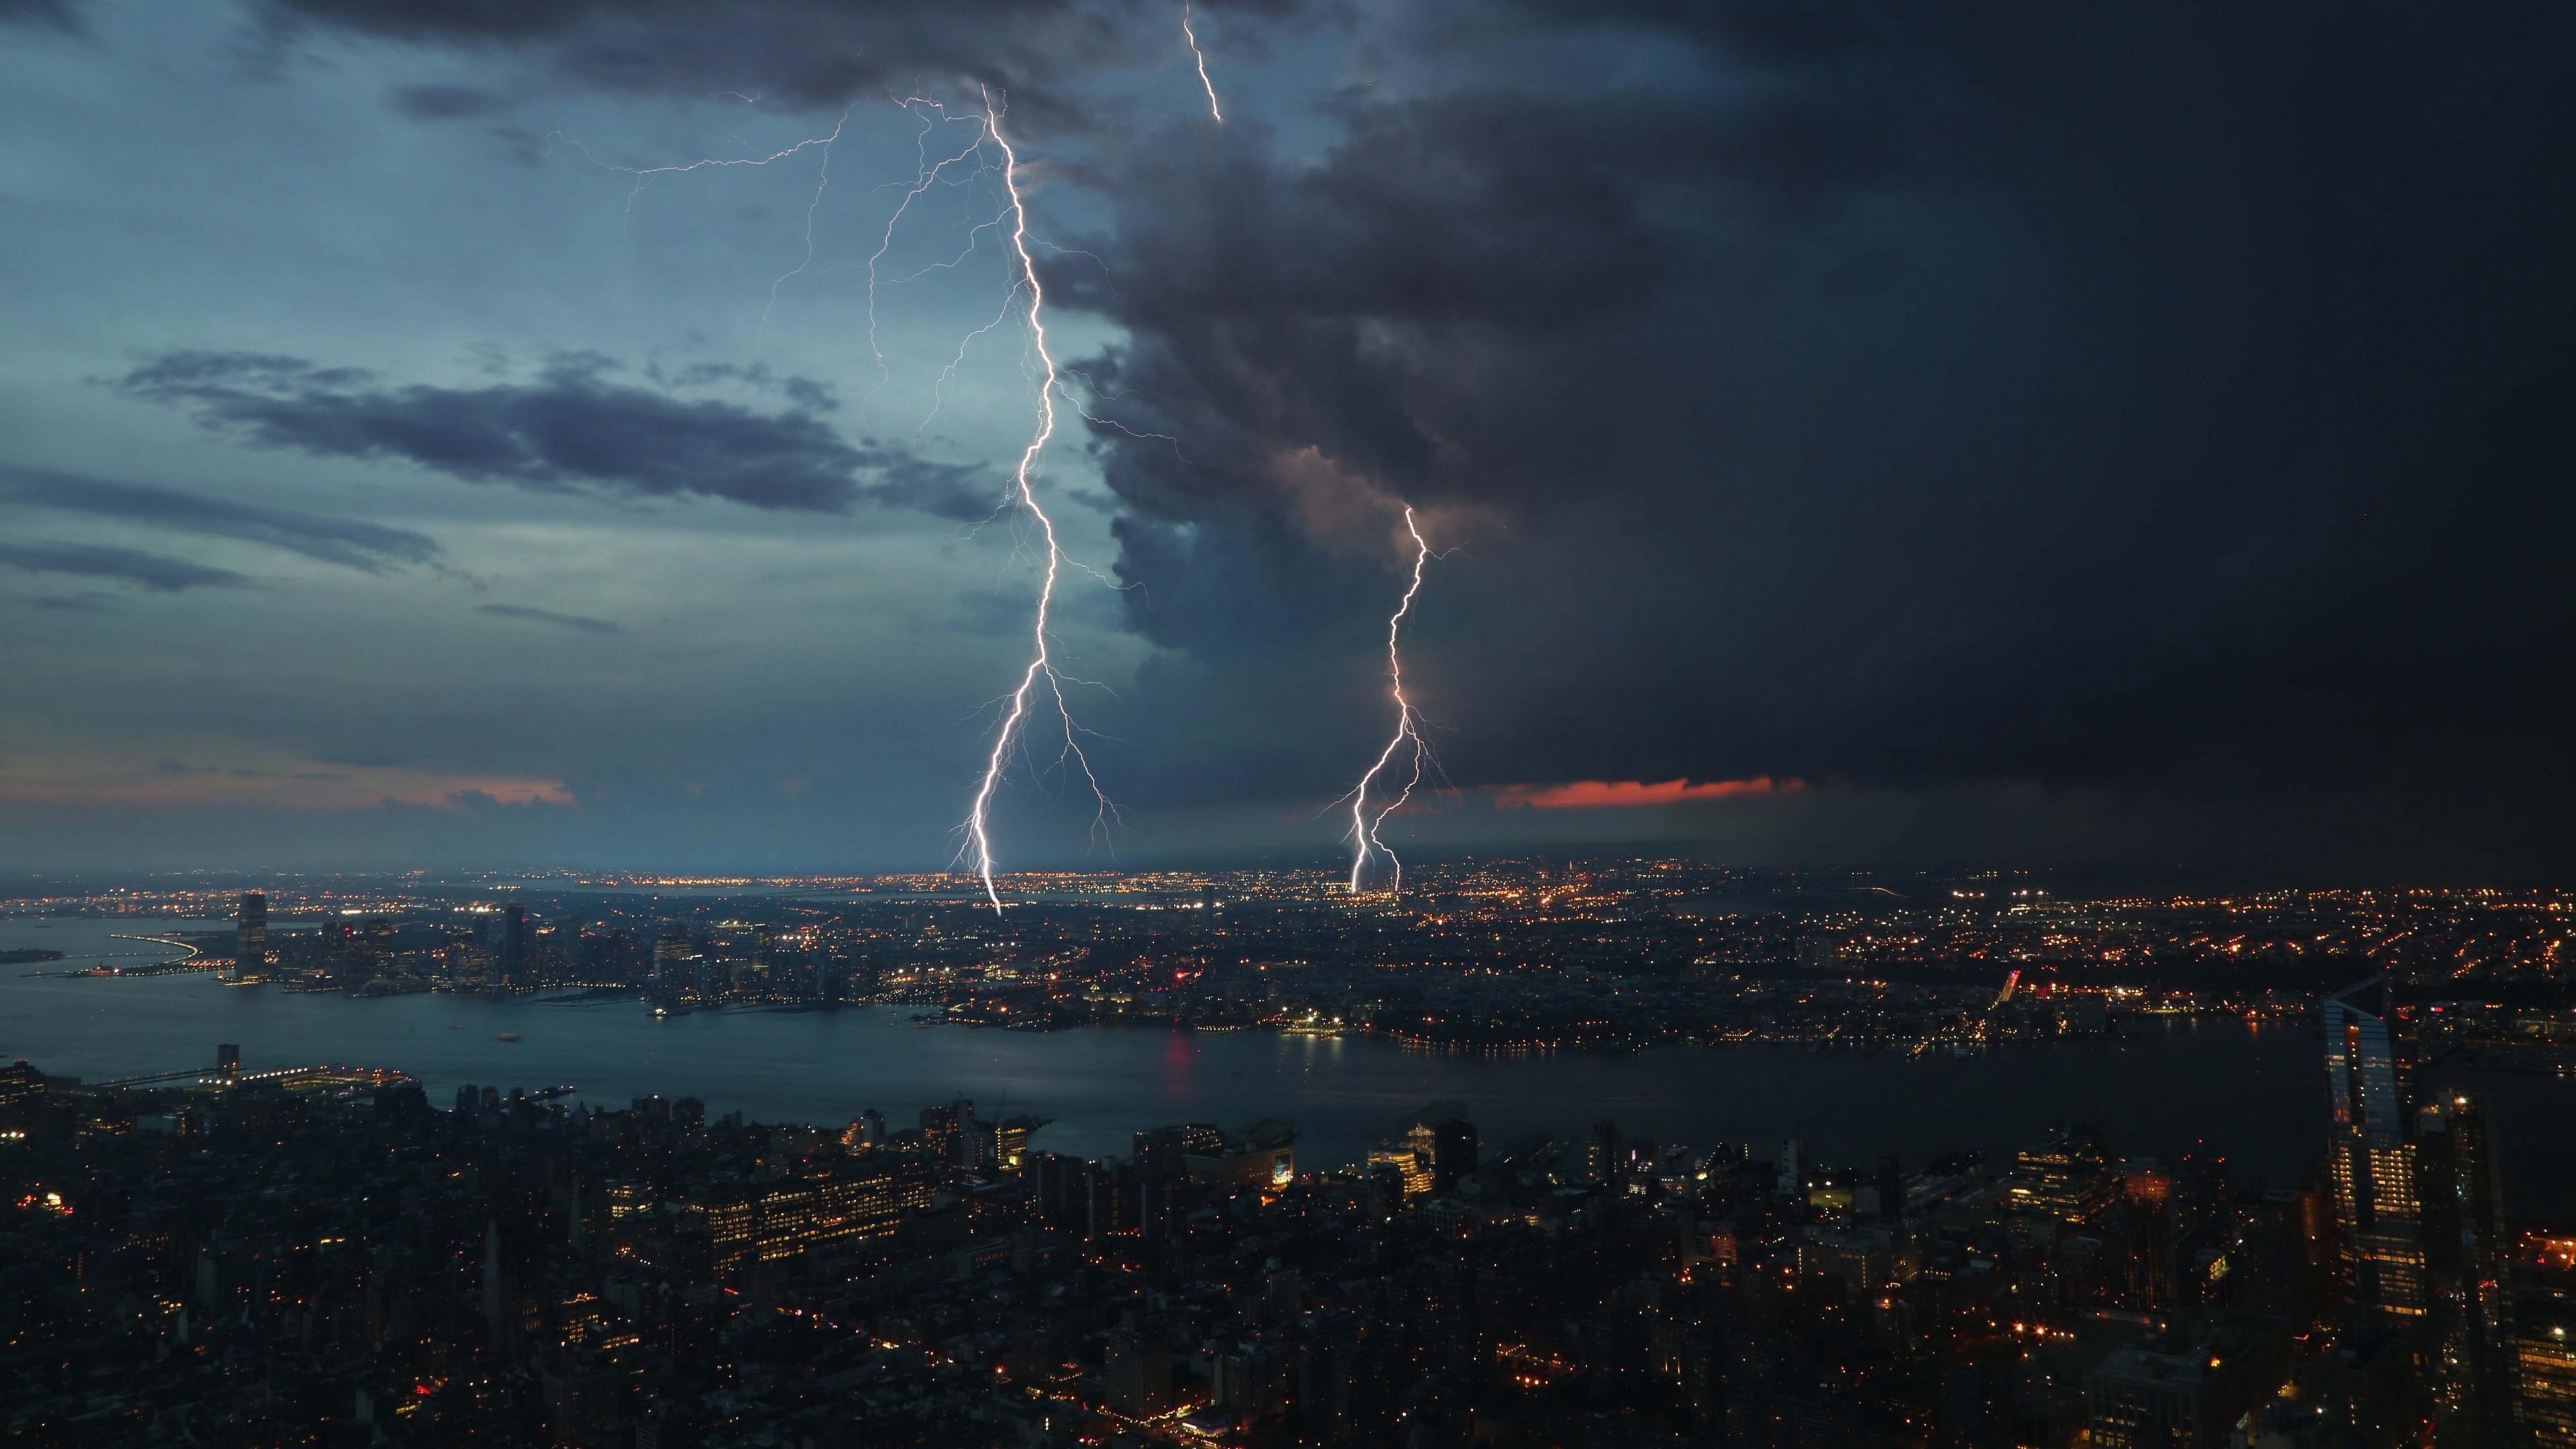 night city thunderstorm top view 4k 1538068112 - night city, thunderstorm, top view 4k - top view, thunderstorm, night city